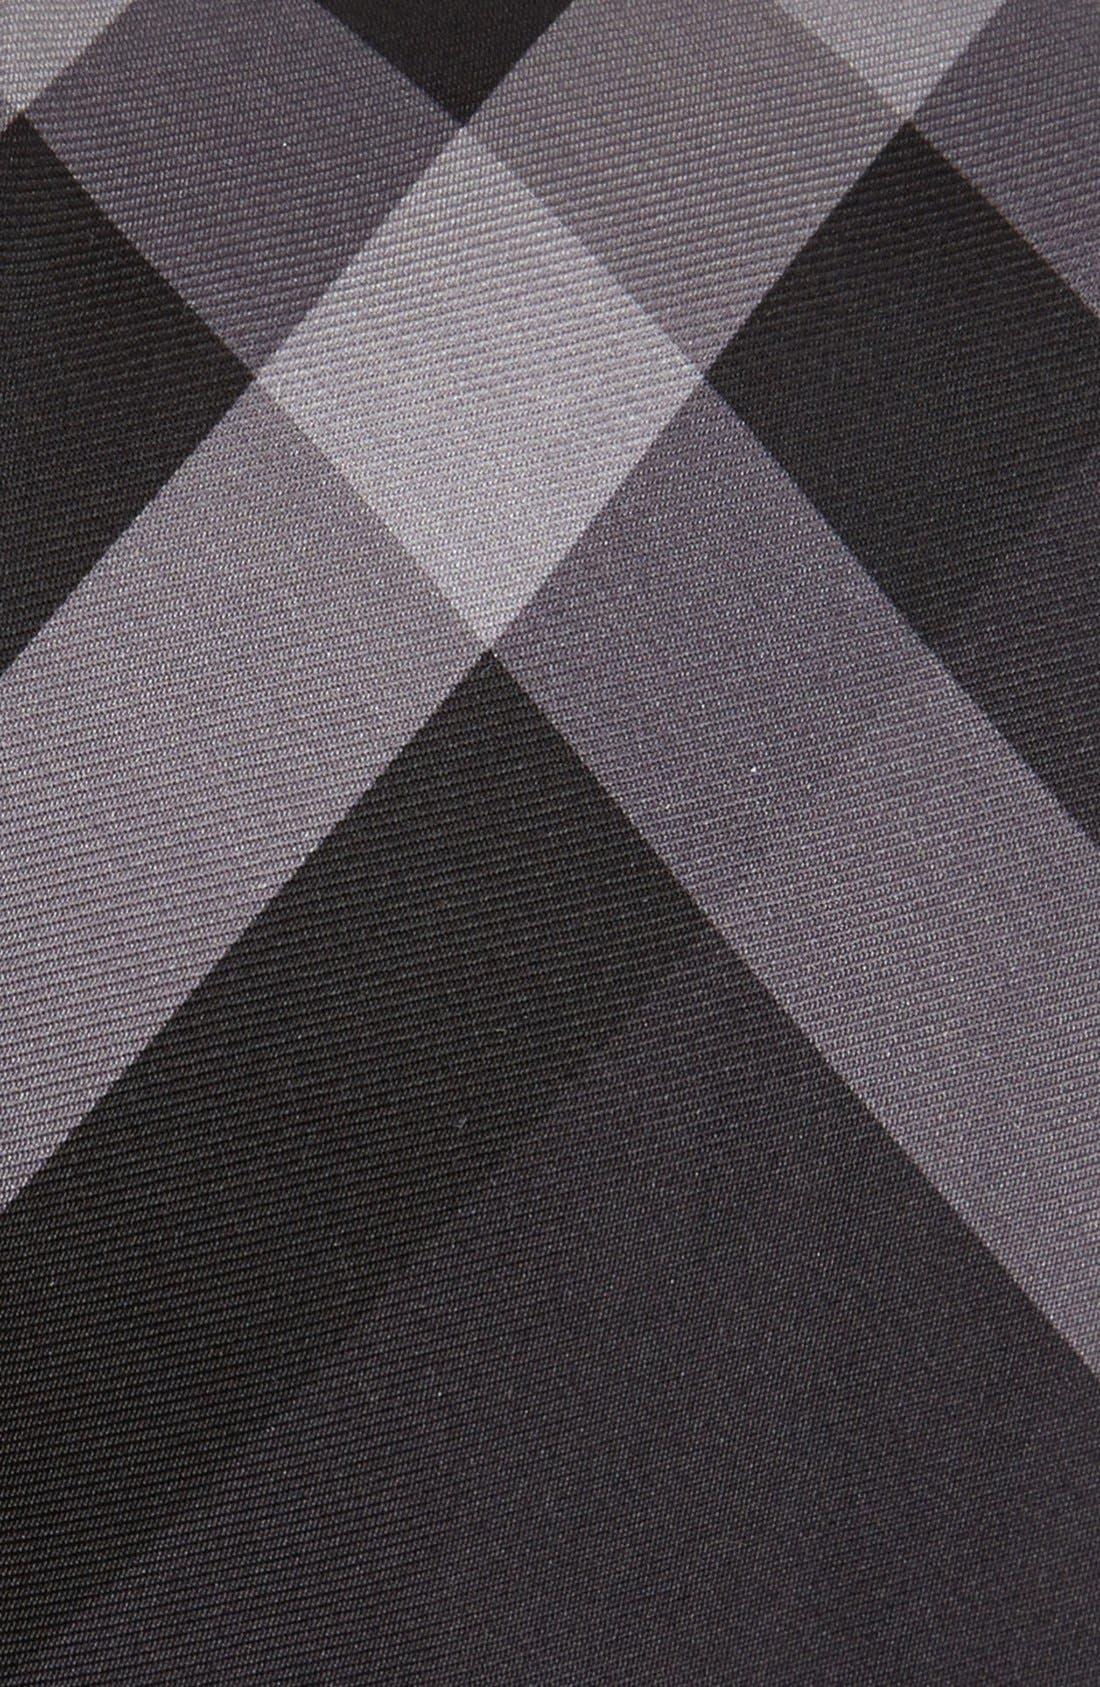 Alternate Image 2  - Burberry London Check Silk Tie